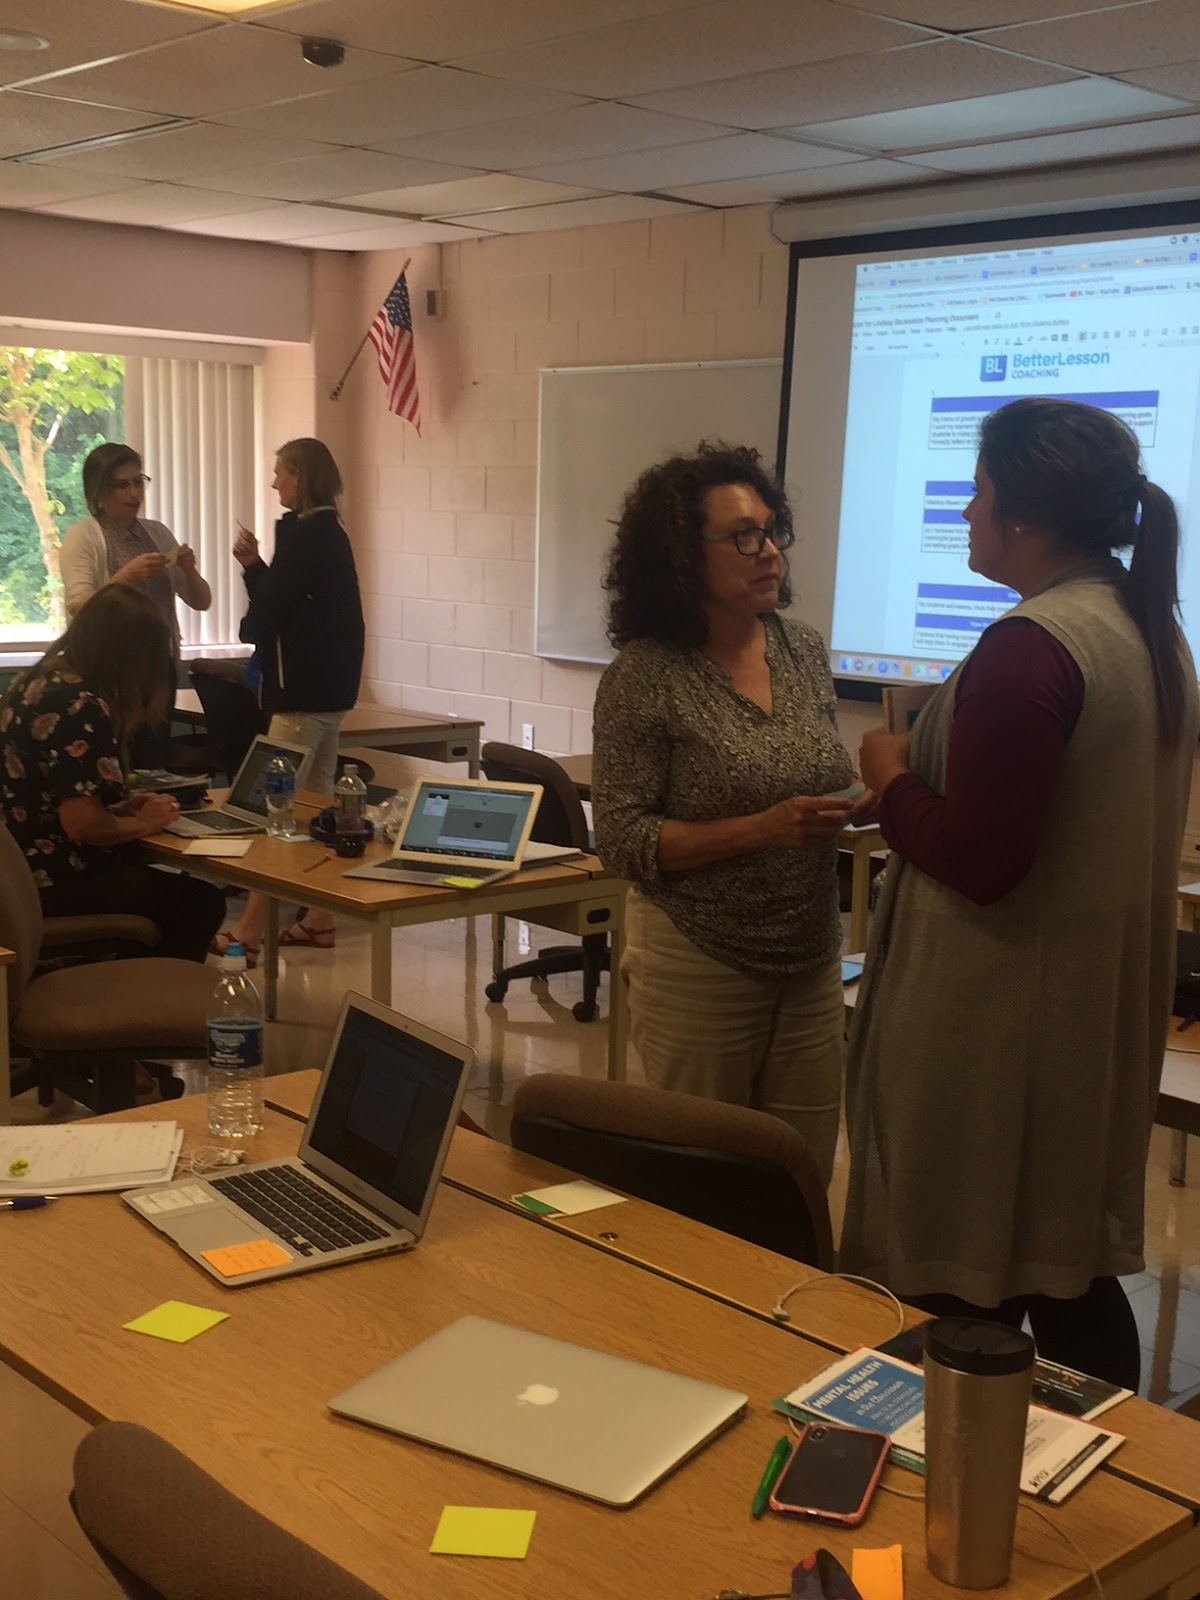 New Buffalo teachers engage at a Design Studio 2018